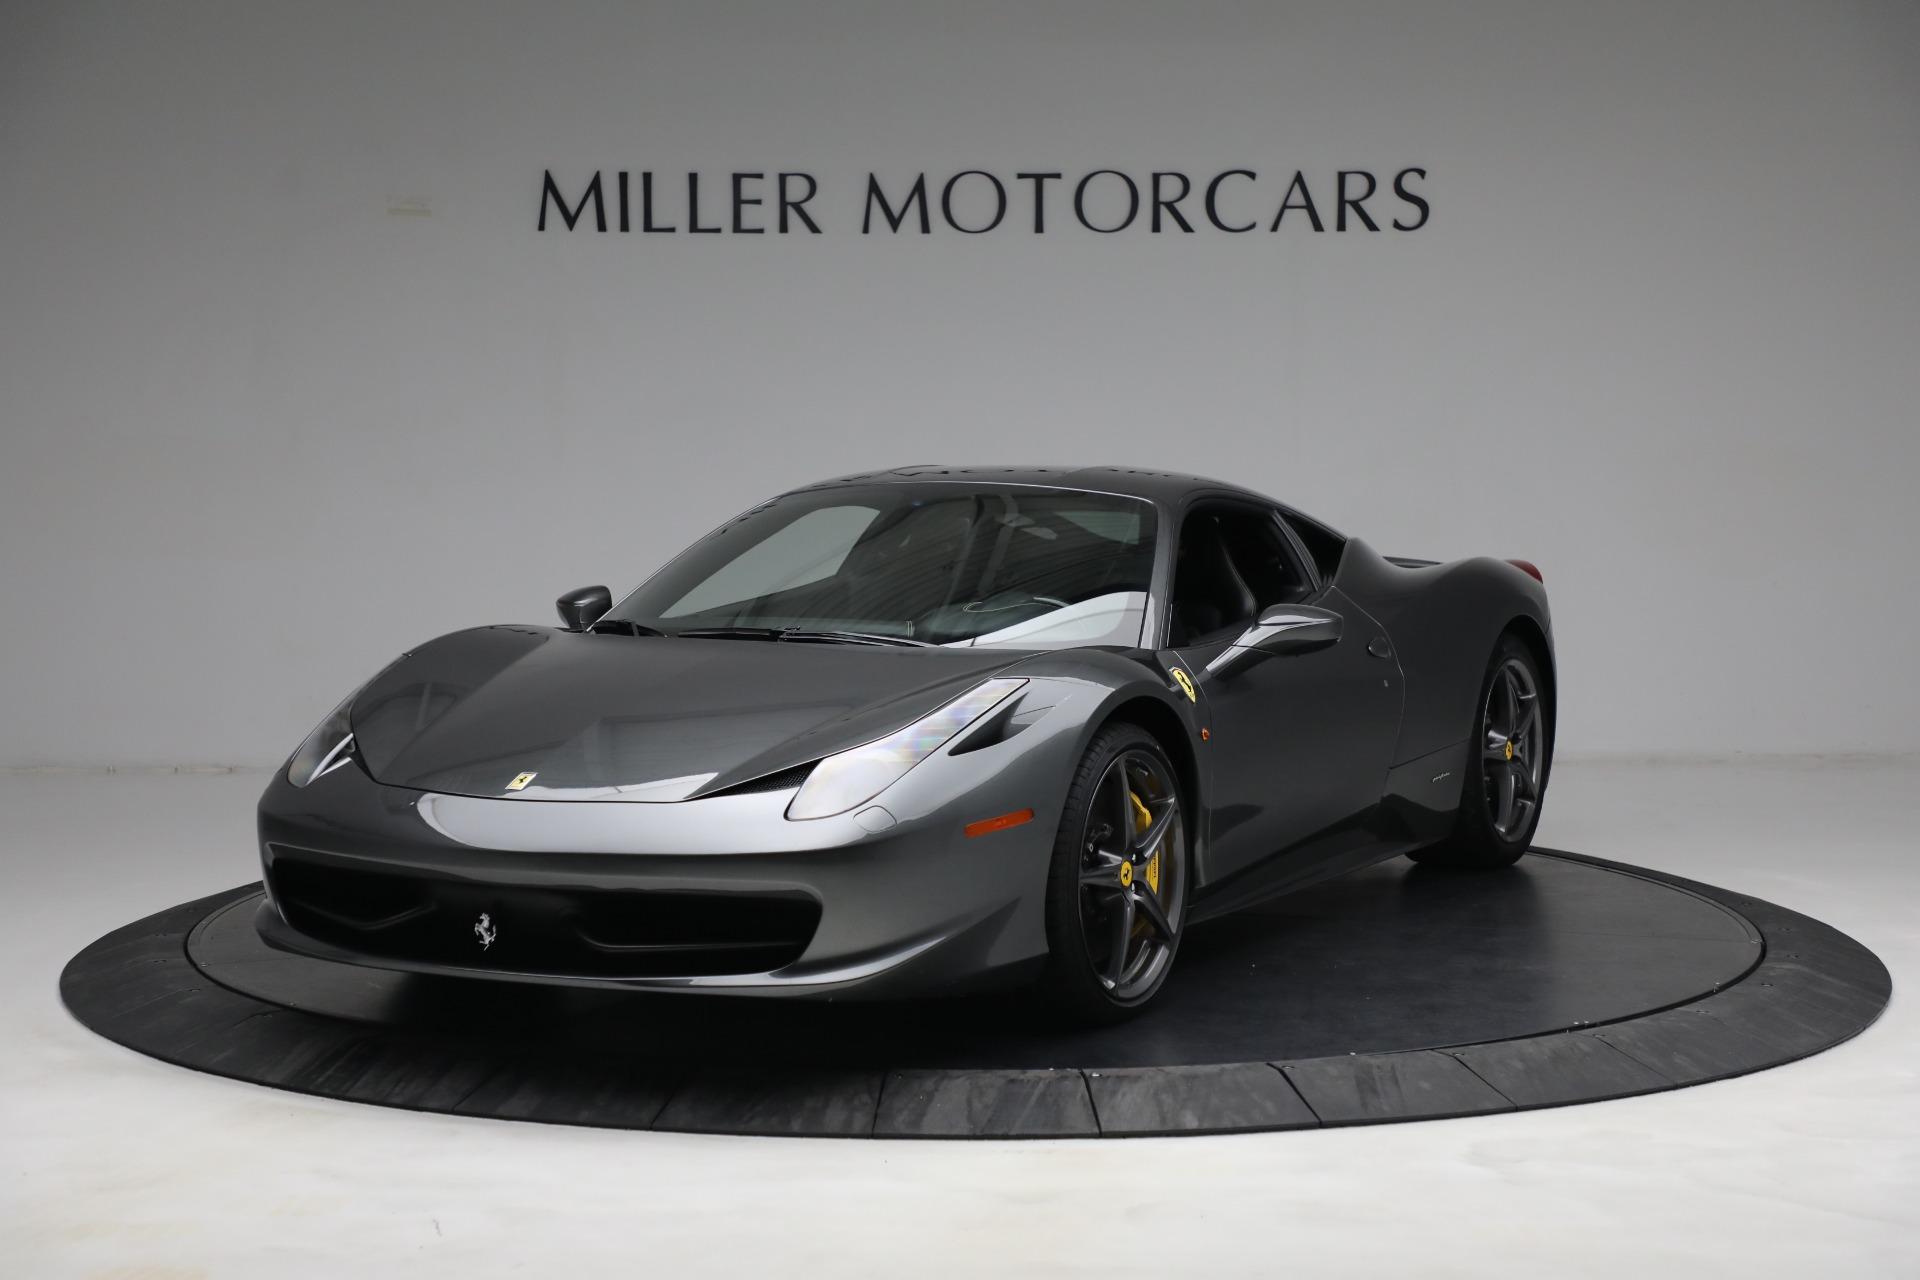 Used 2011 Ferrari 458 Italia for sale $229,900 at Rolls-Royce Motor Cars Greenwich in Greenwich CT 06830 1